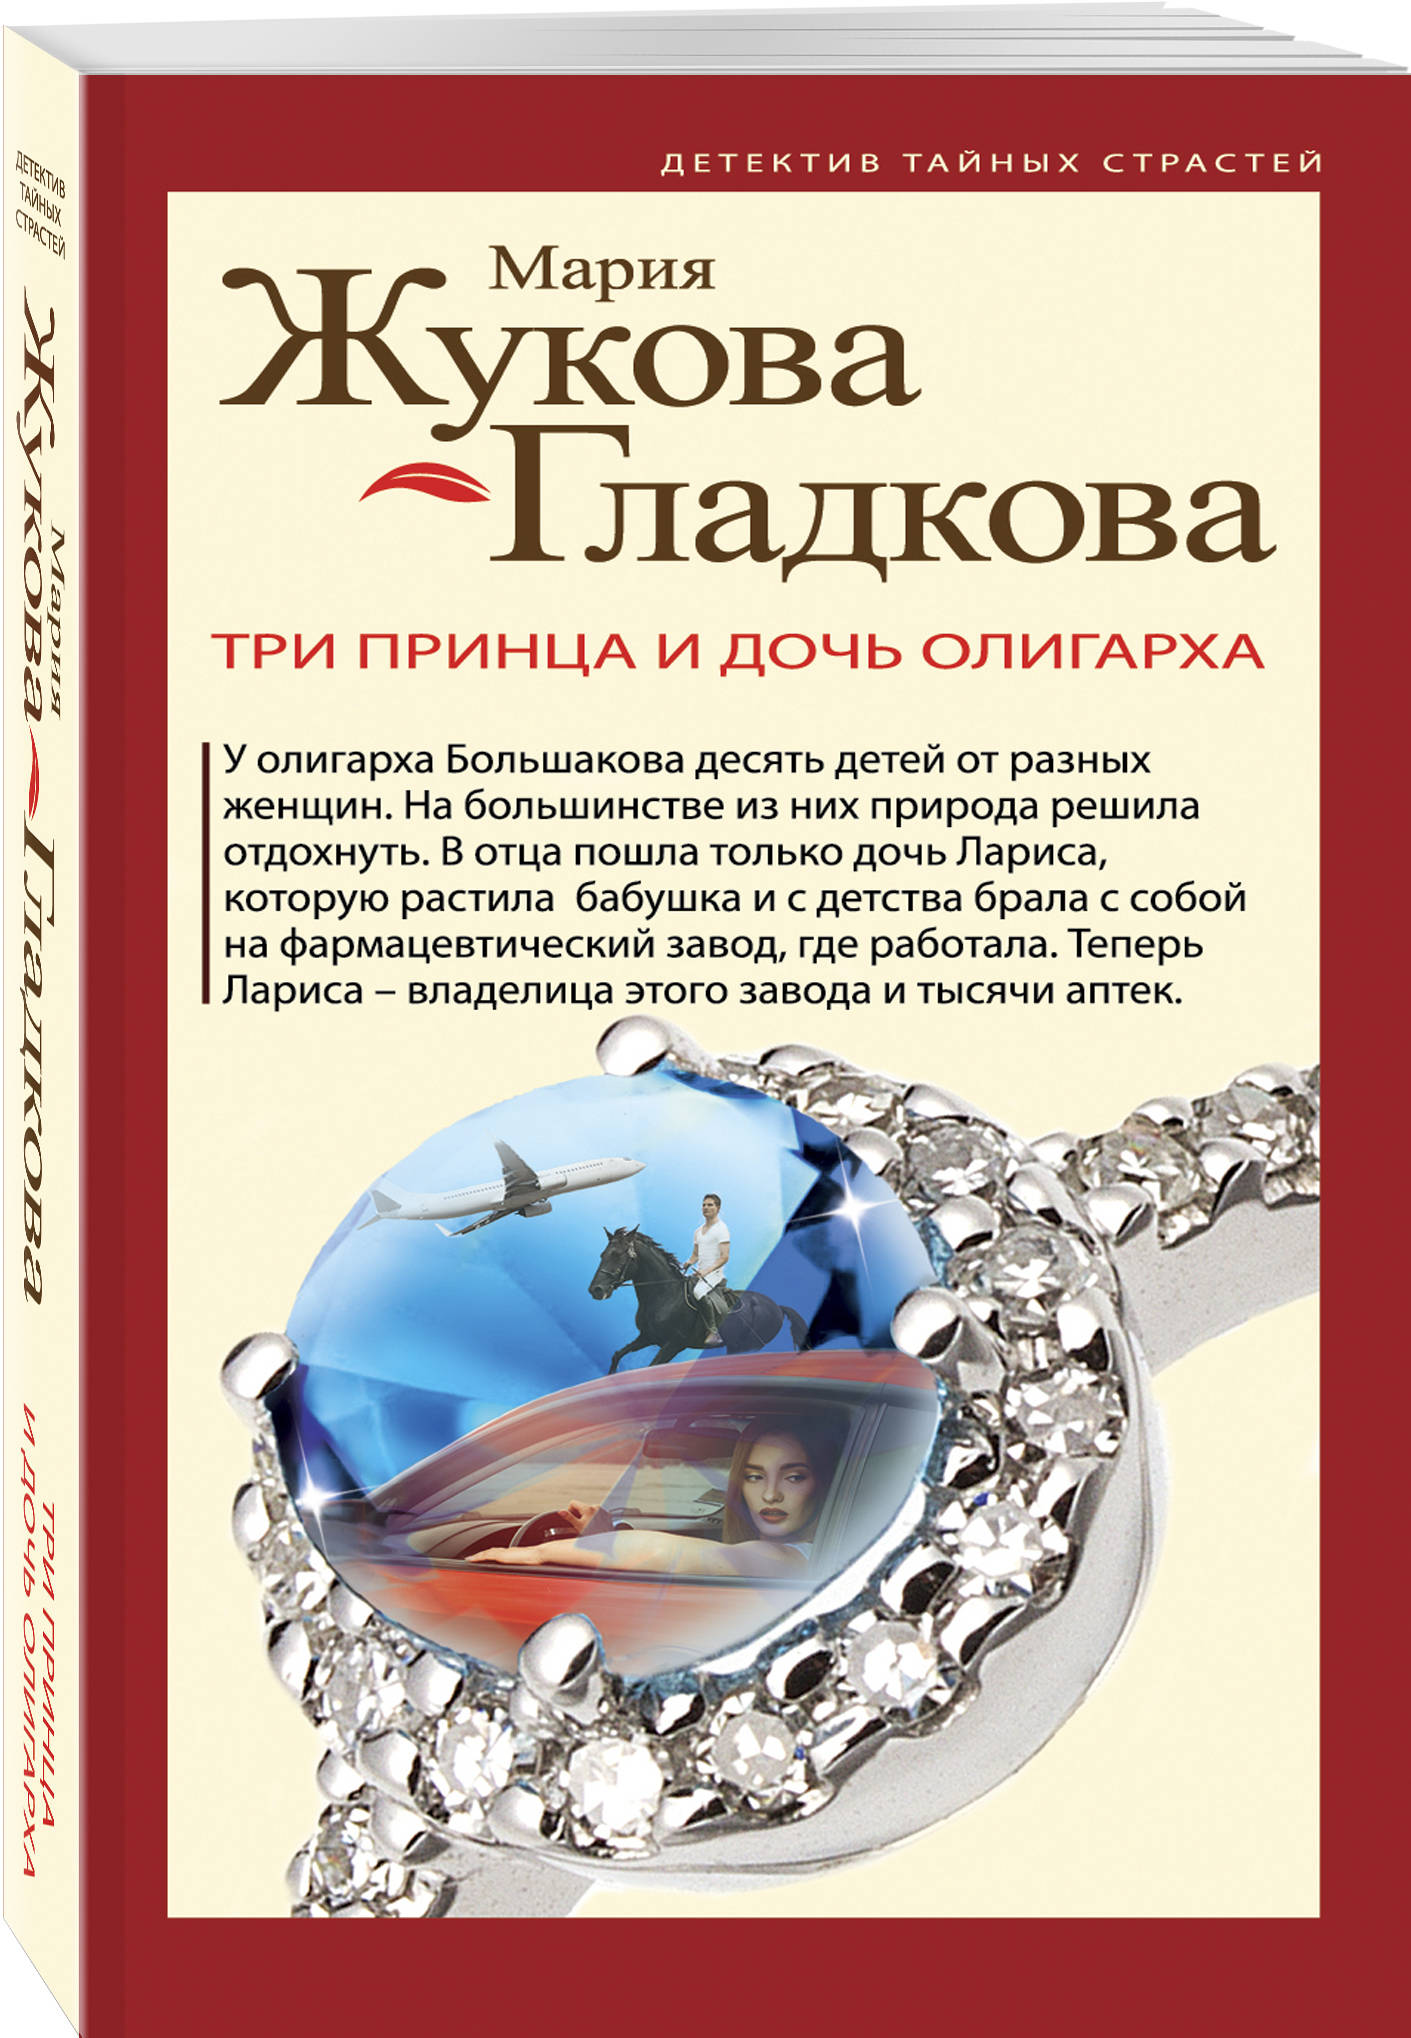 Мария Жукова-Гладкова Три принца и дочь олигарха